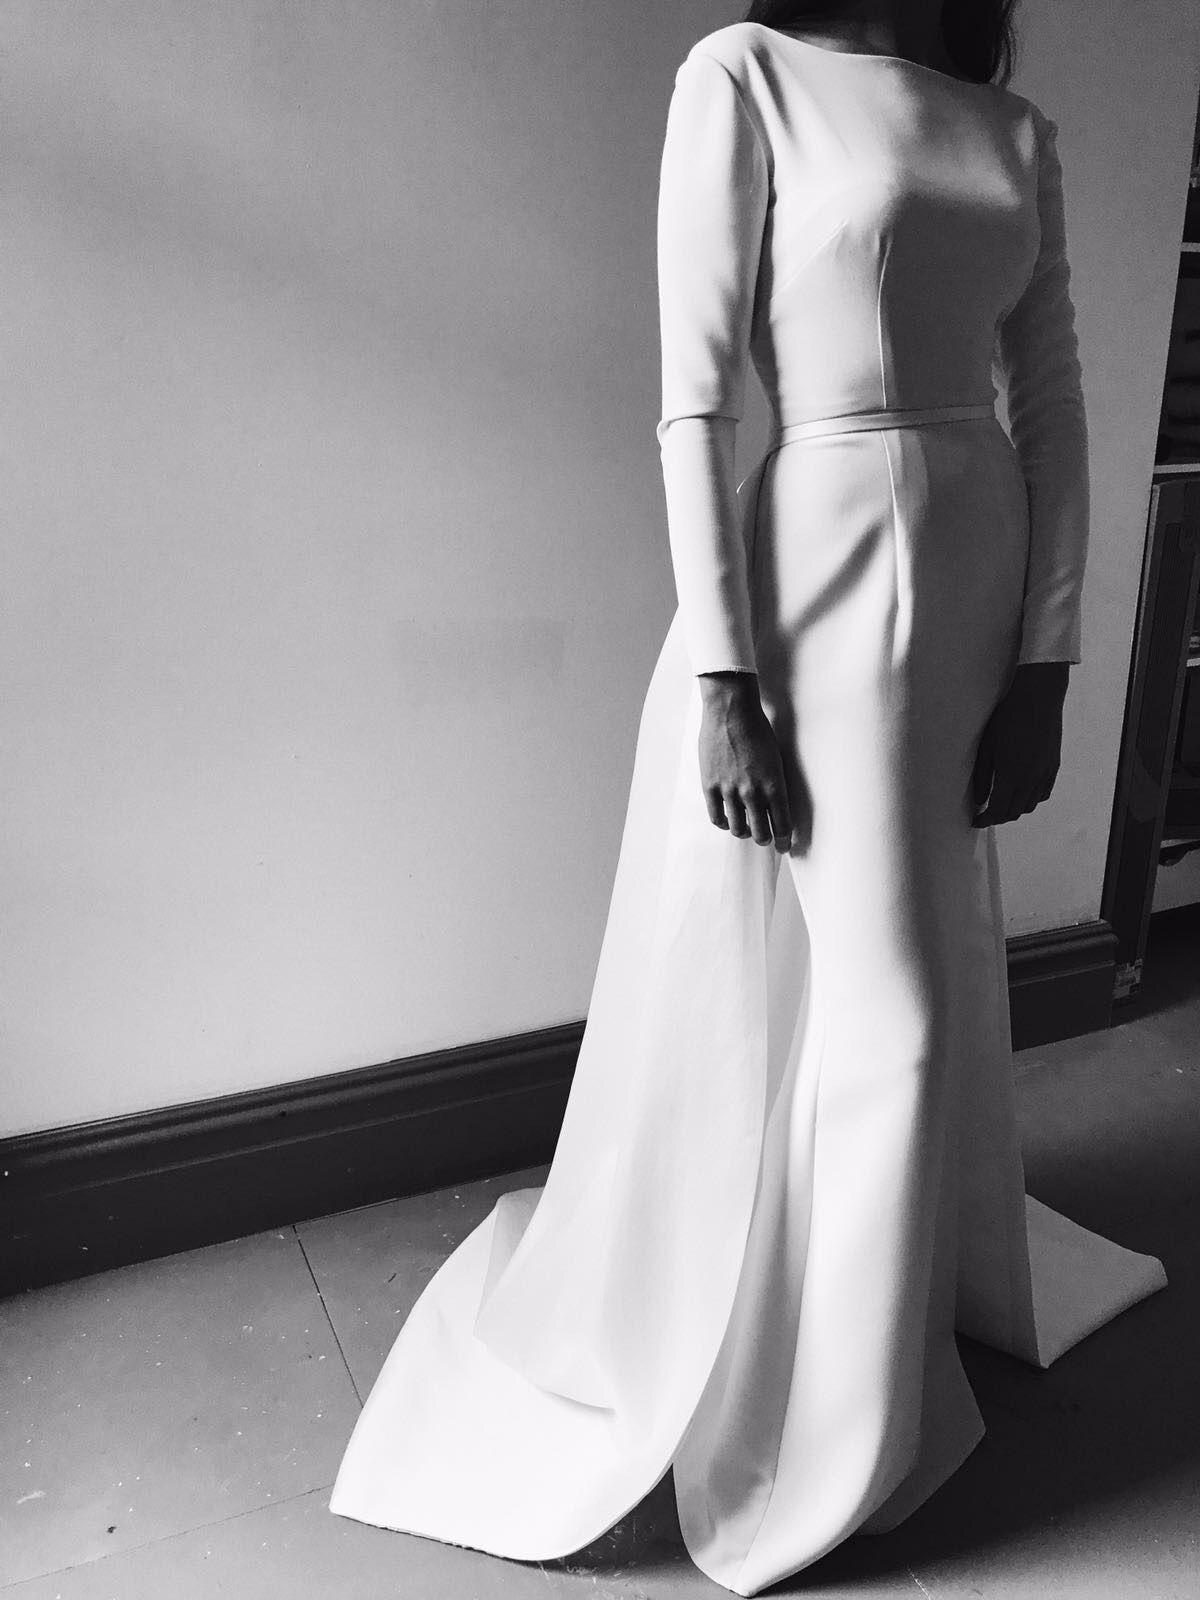 Wedding Inspirtion 17/18: Minimalism, Structural Design. Jessica Bennett Bespoke. #minimalbride #Wedding #Style #Bespoke